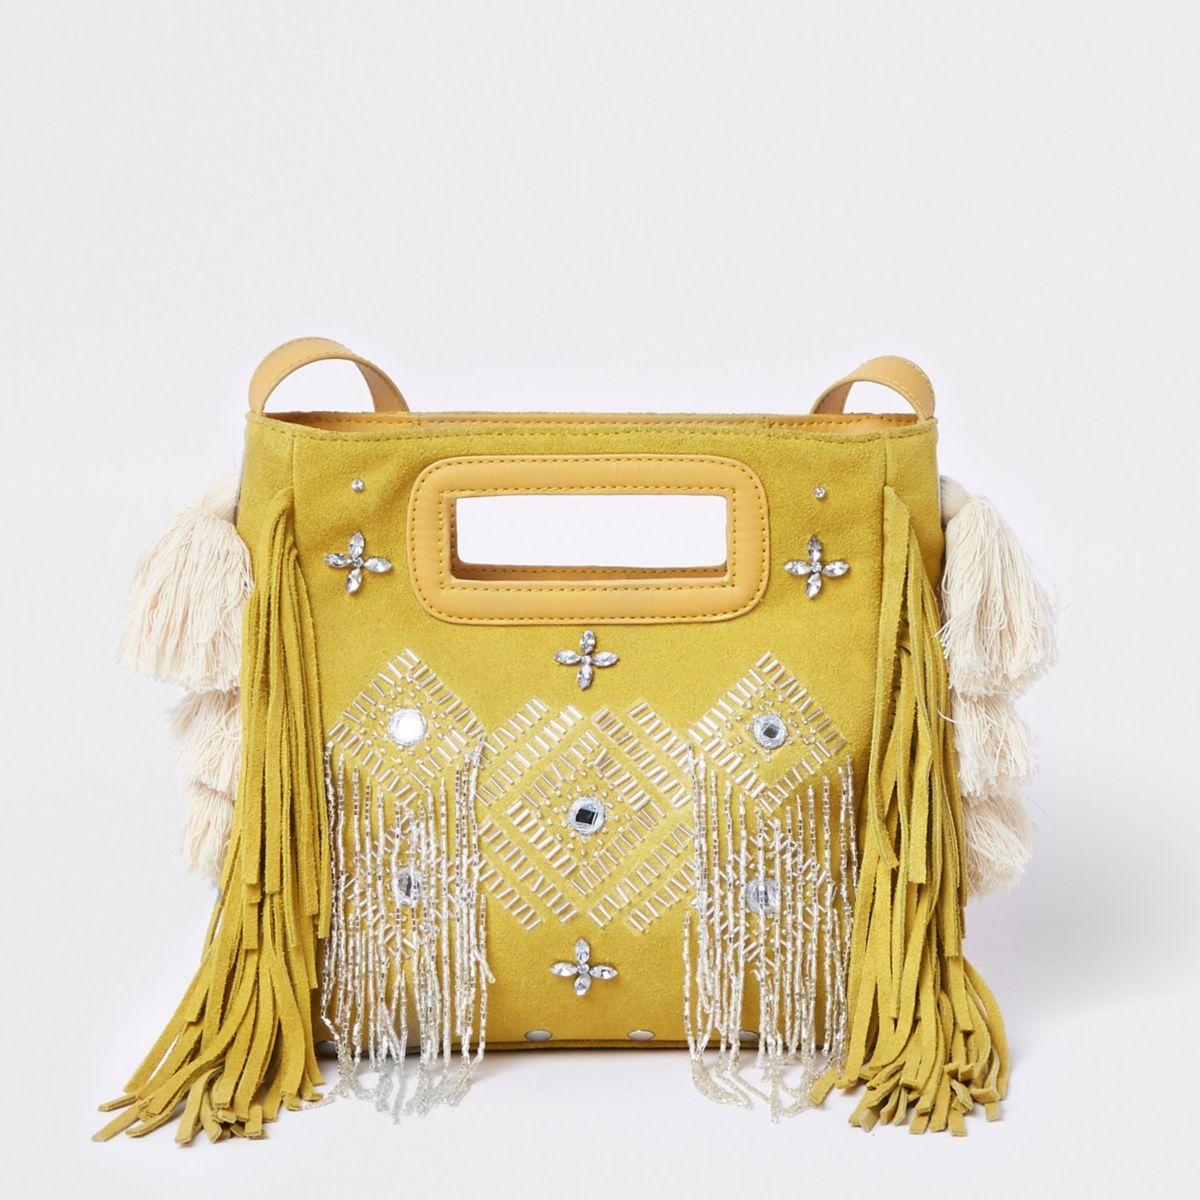 Yellow suede embellished cross body bag